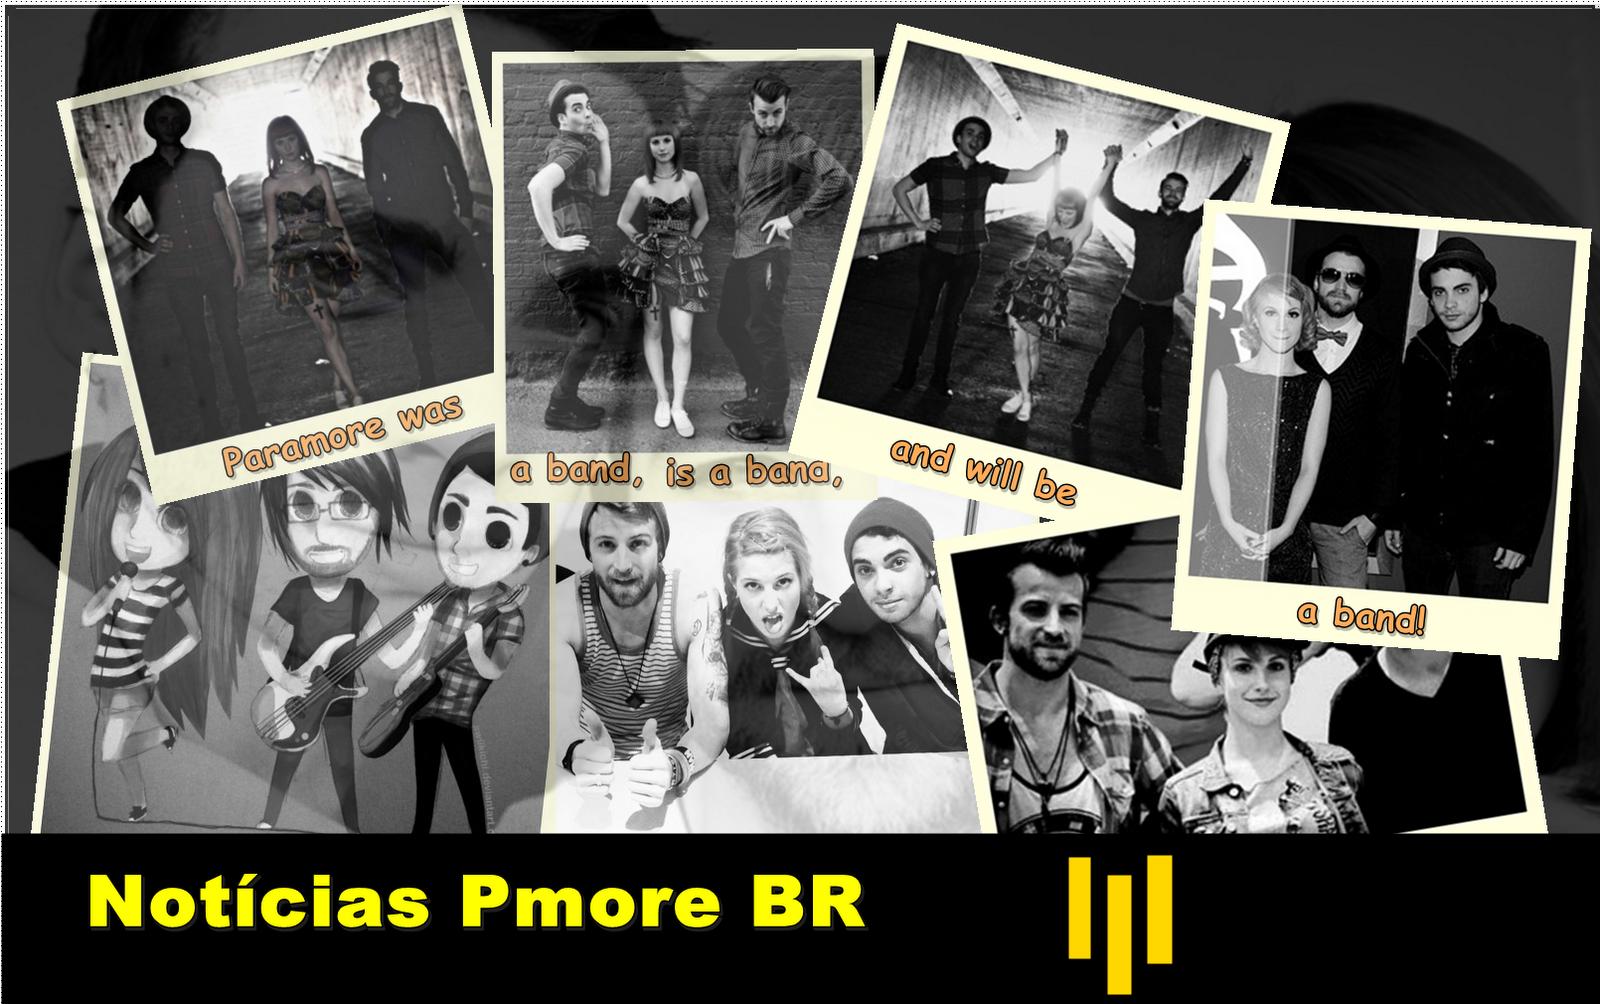 Notícias Pmore BR